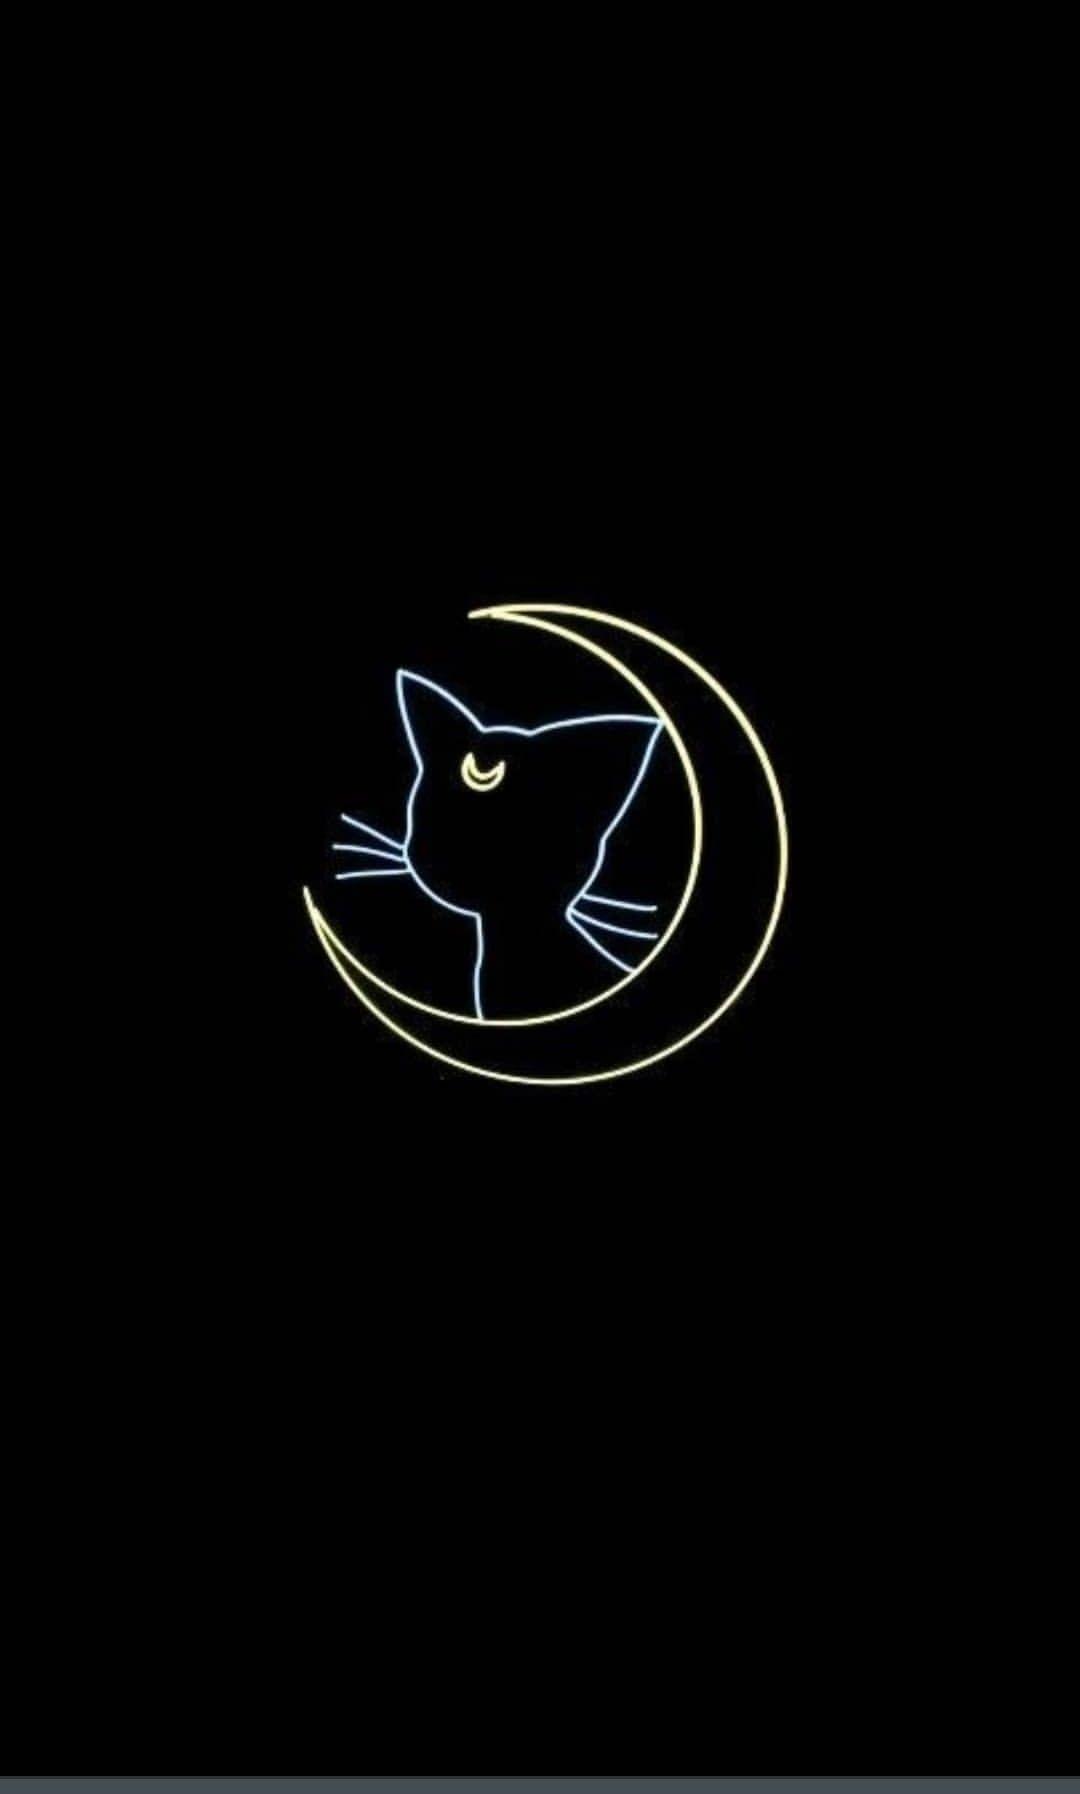 Pin By Yeppeun Yeoja On Fondos De Pantalla Sailor Moon Wallpaper Sailor Moon Tattoo Cat Tattoo Designs